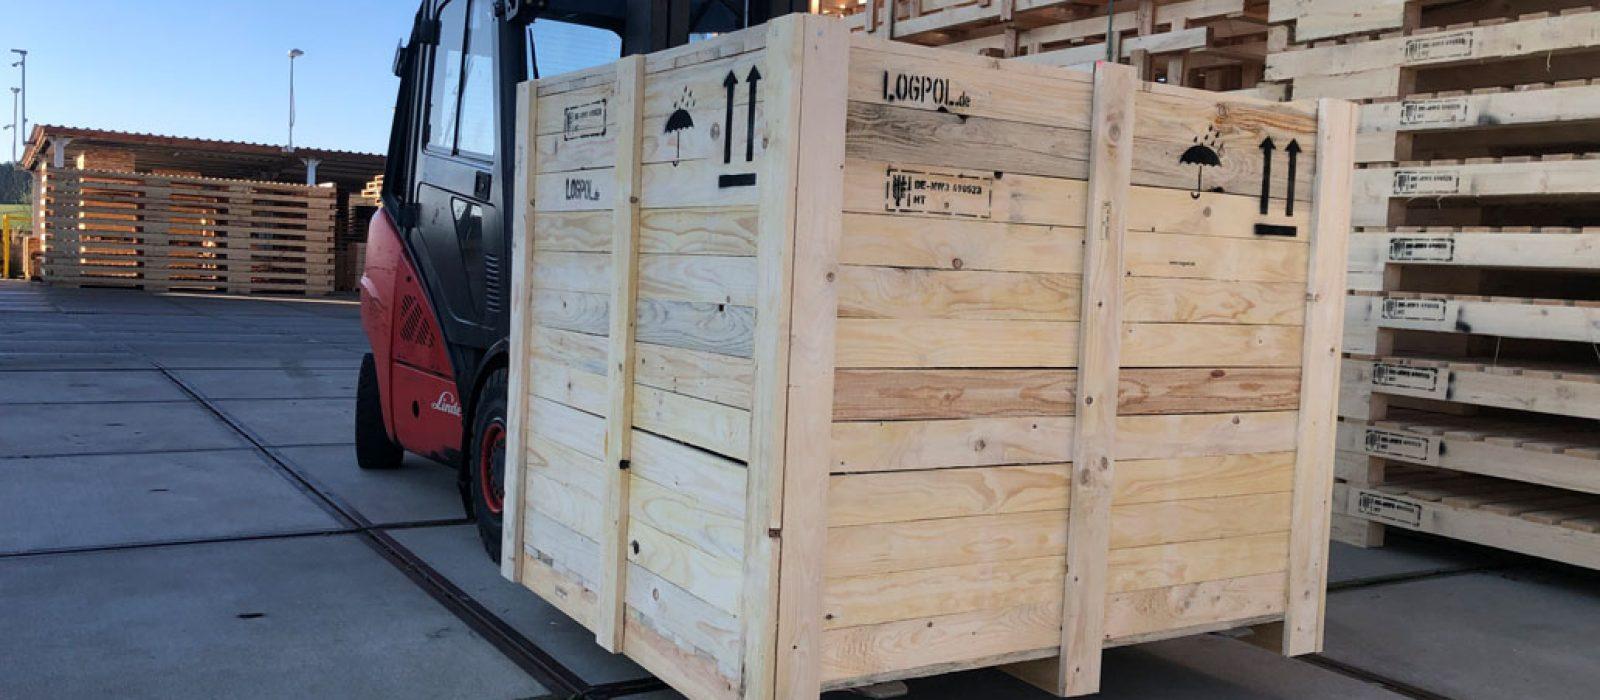 Holzkiste-1350x1350x1350-mm-LOGPOL